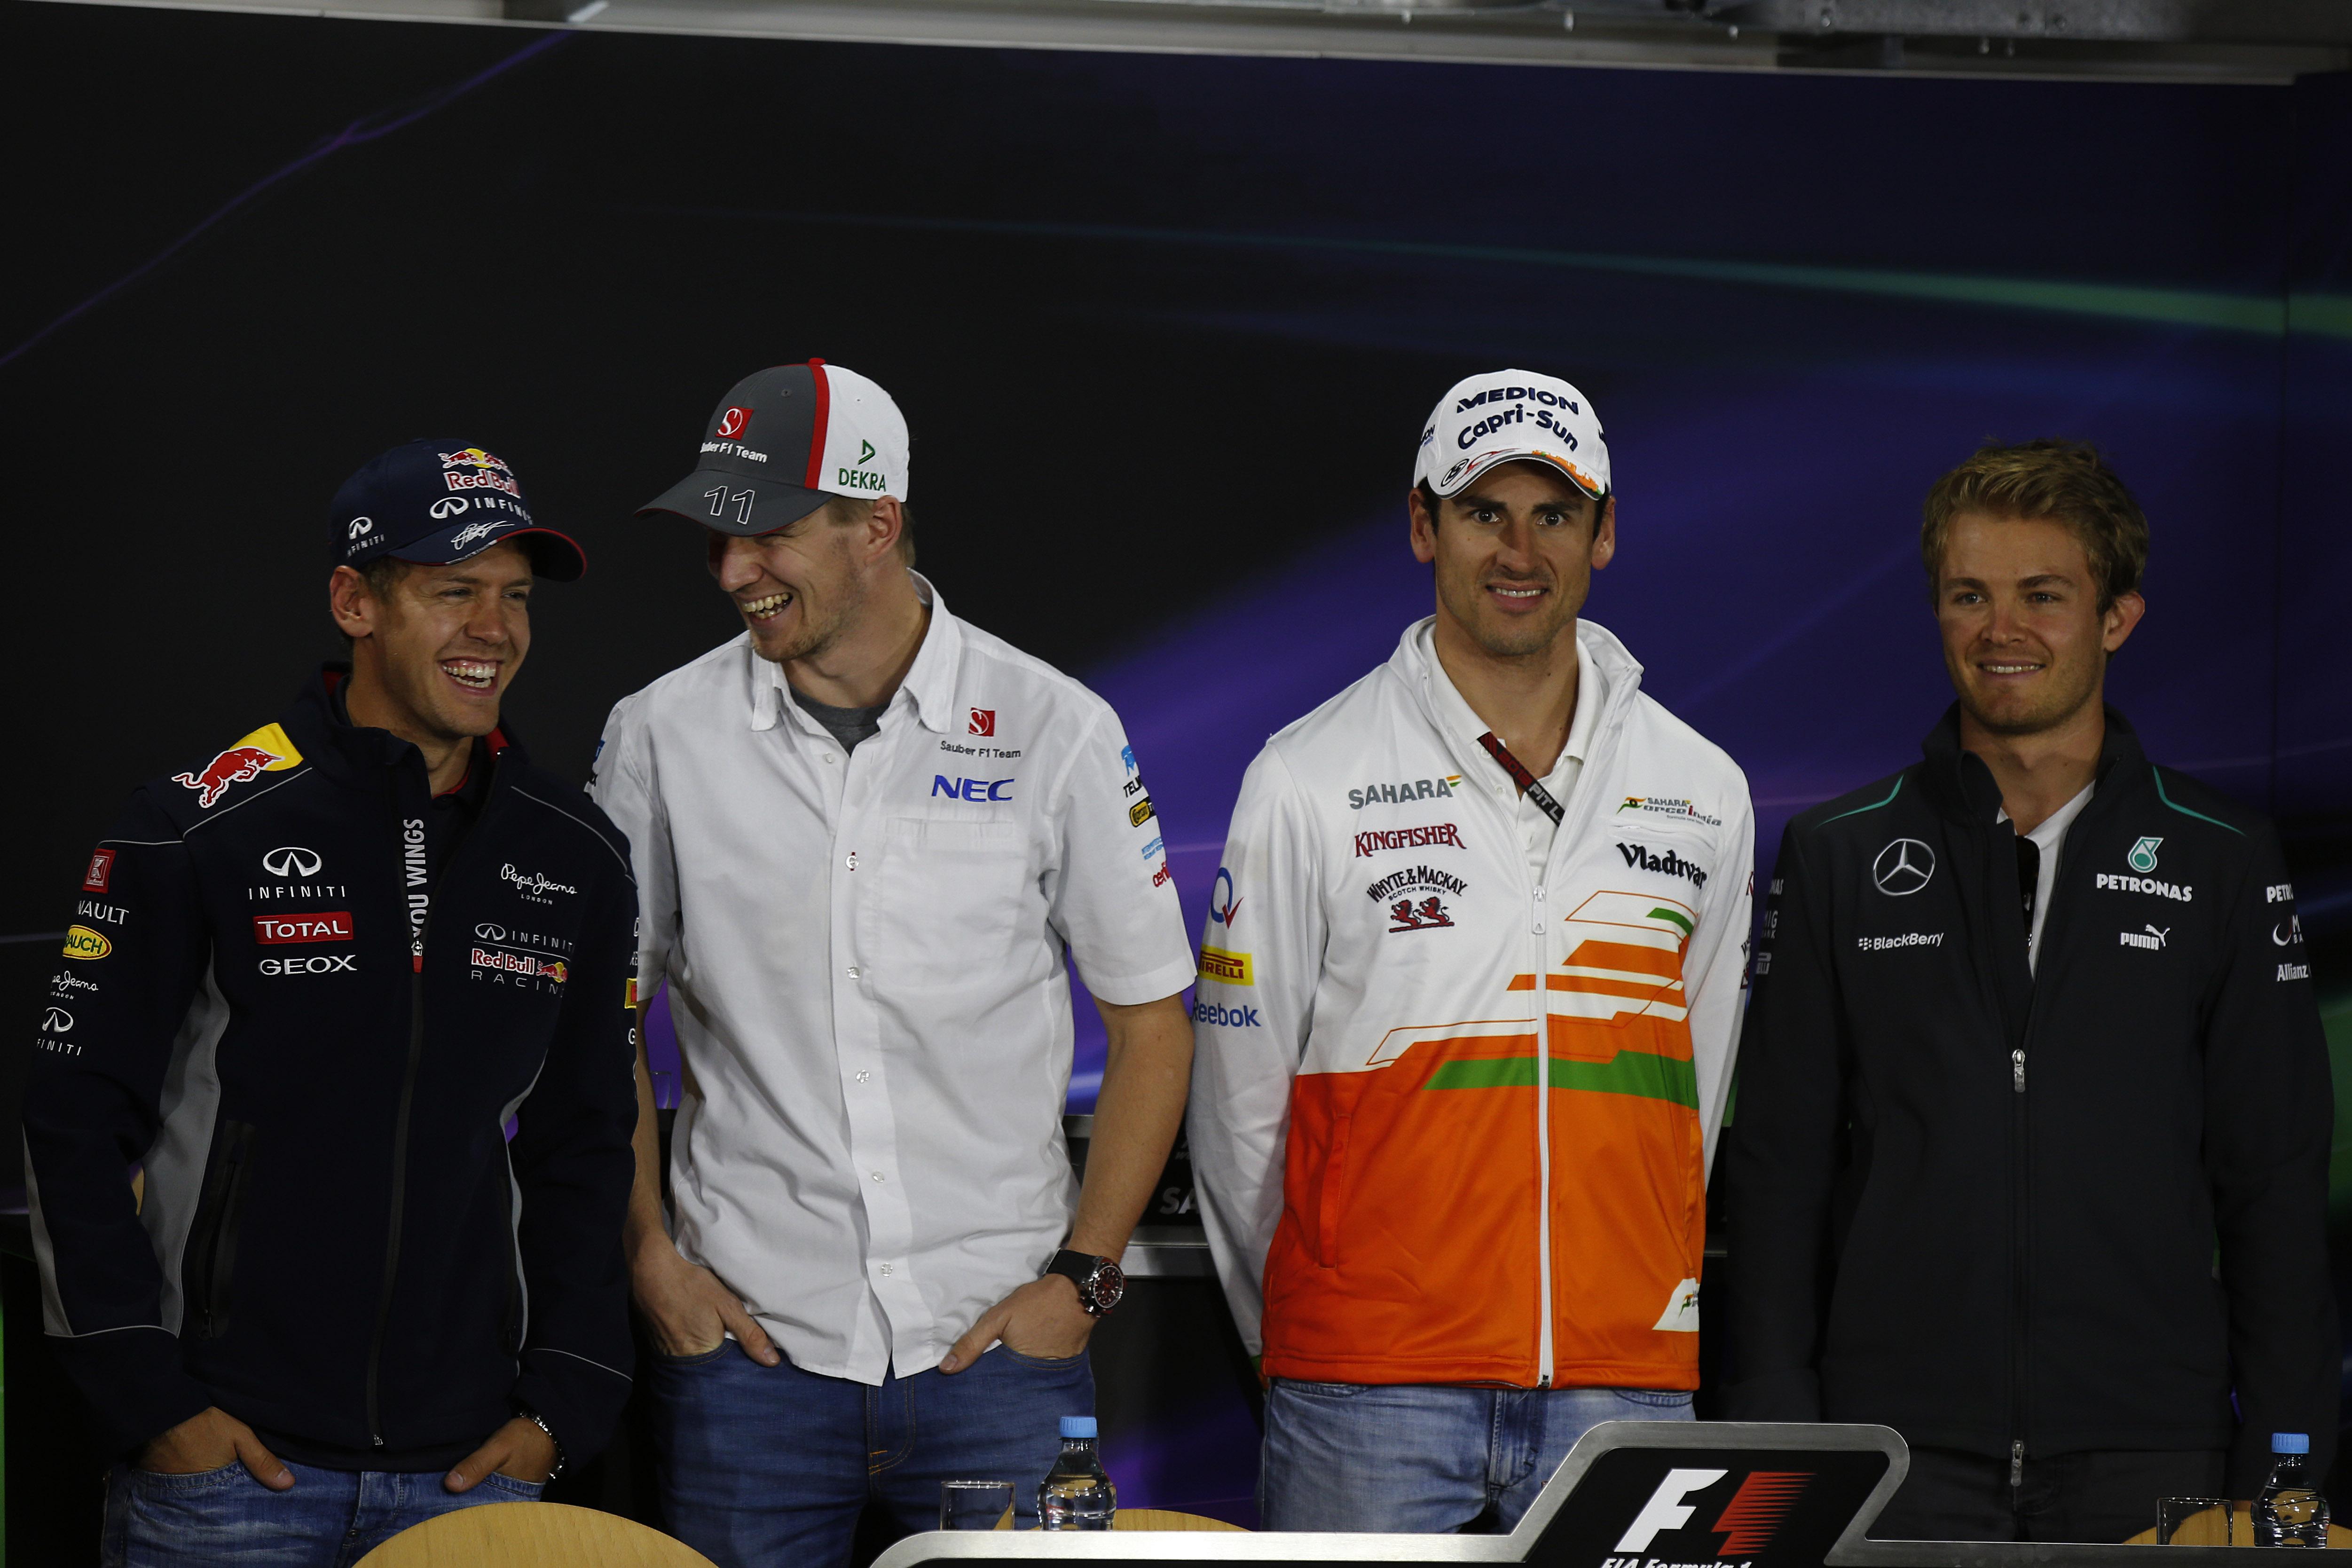 F1 2013 - German Grand Prix